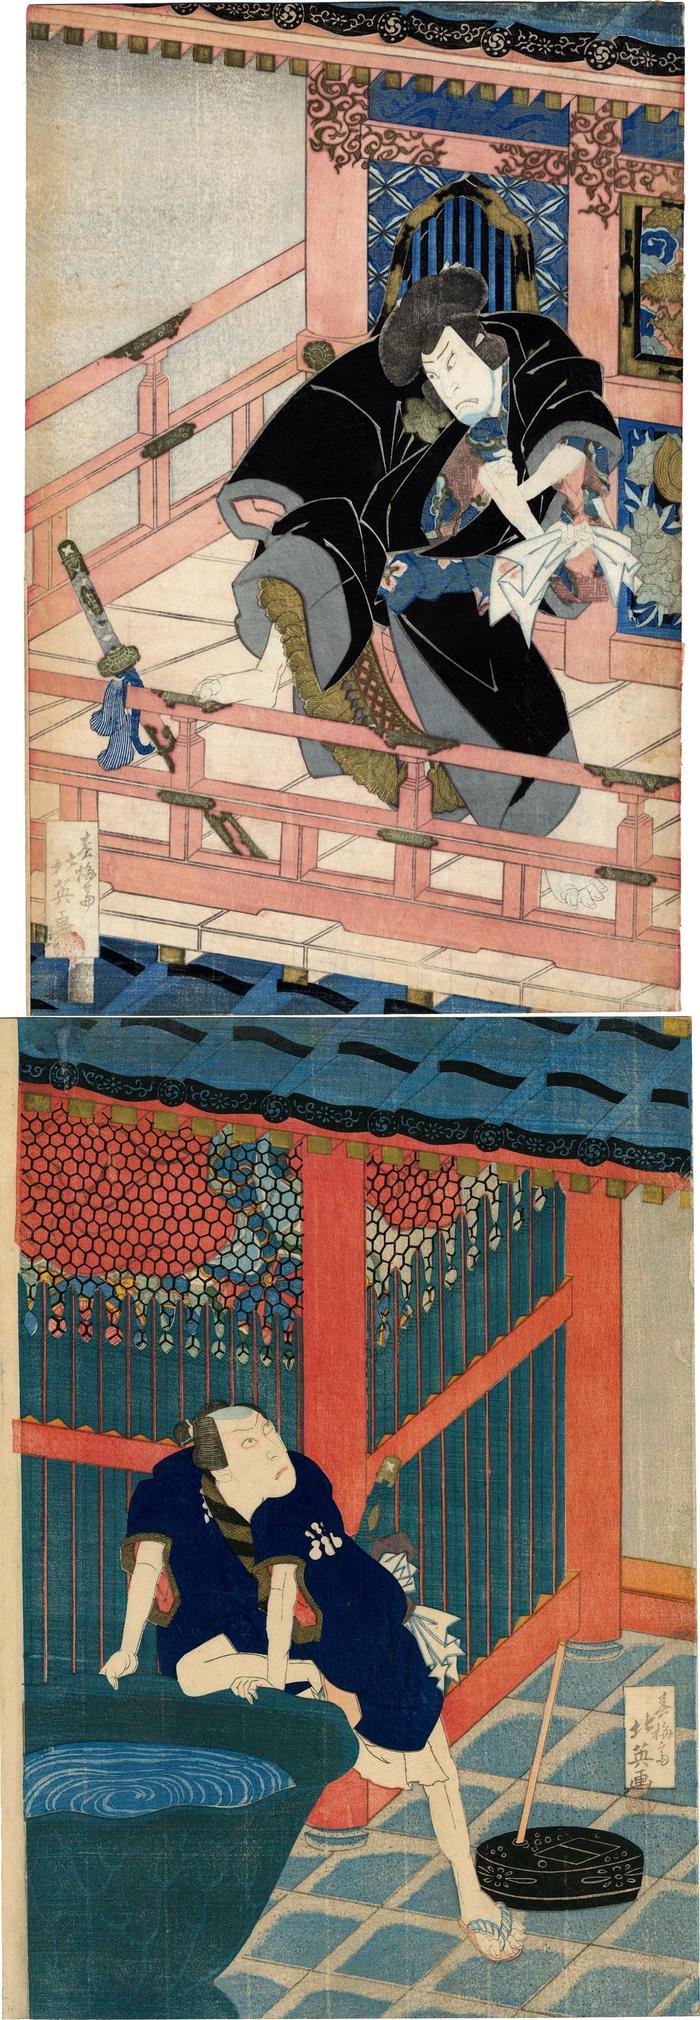 Vertical diptych. Top: Nakamura Shikan II (中村芝翫) as Ishikawa Goemon (石川五右衛門). Bottom: Ichikawa Ebizō V (市川海老蔵) as Hisayoshi Mashiba(真柴久よし)